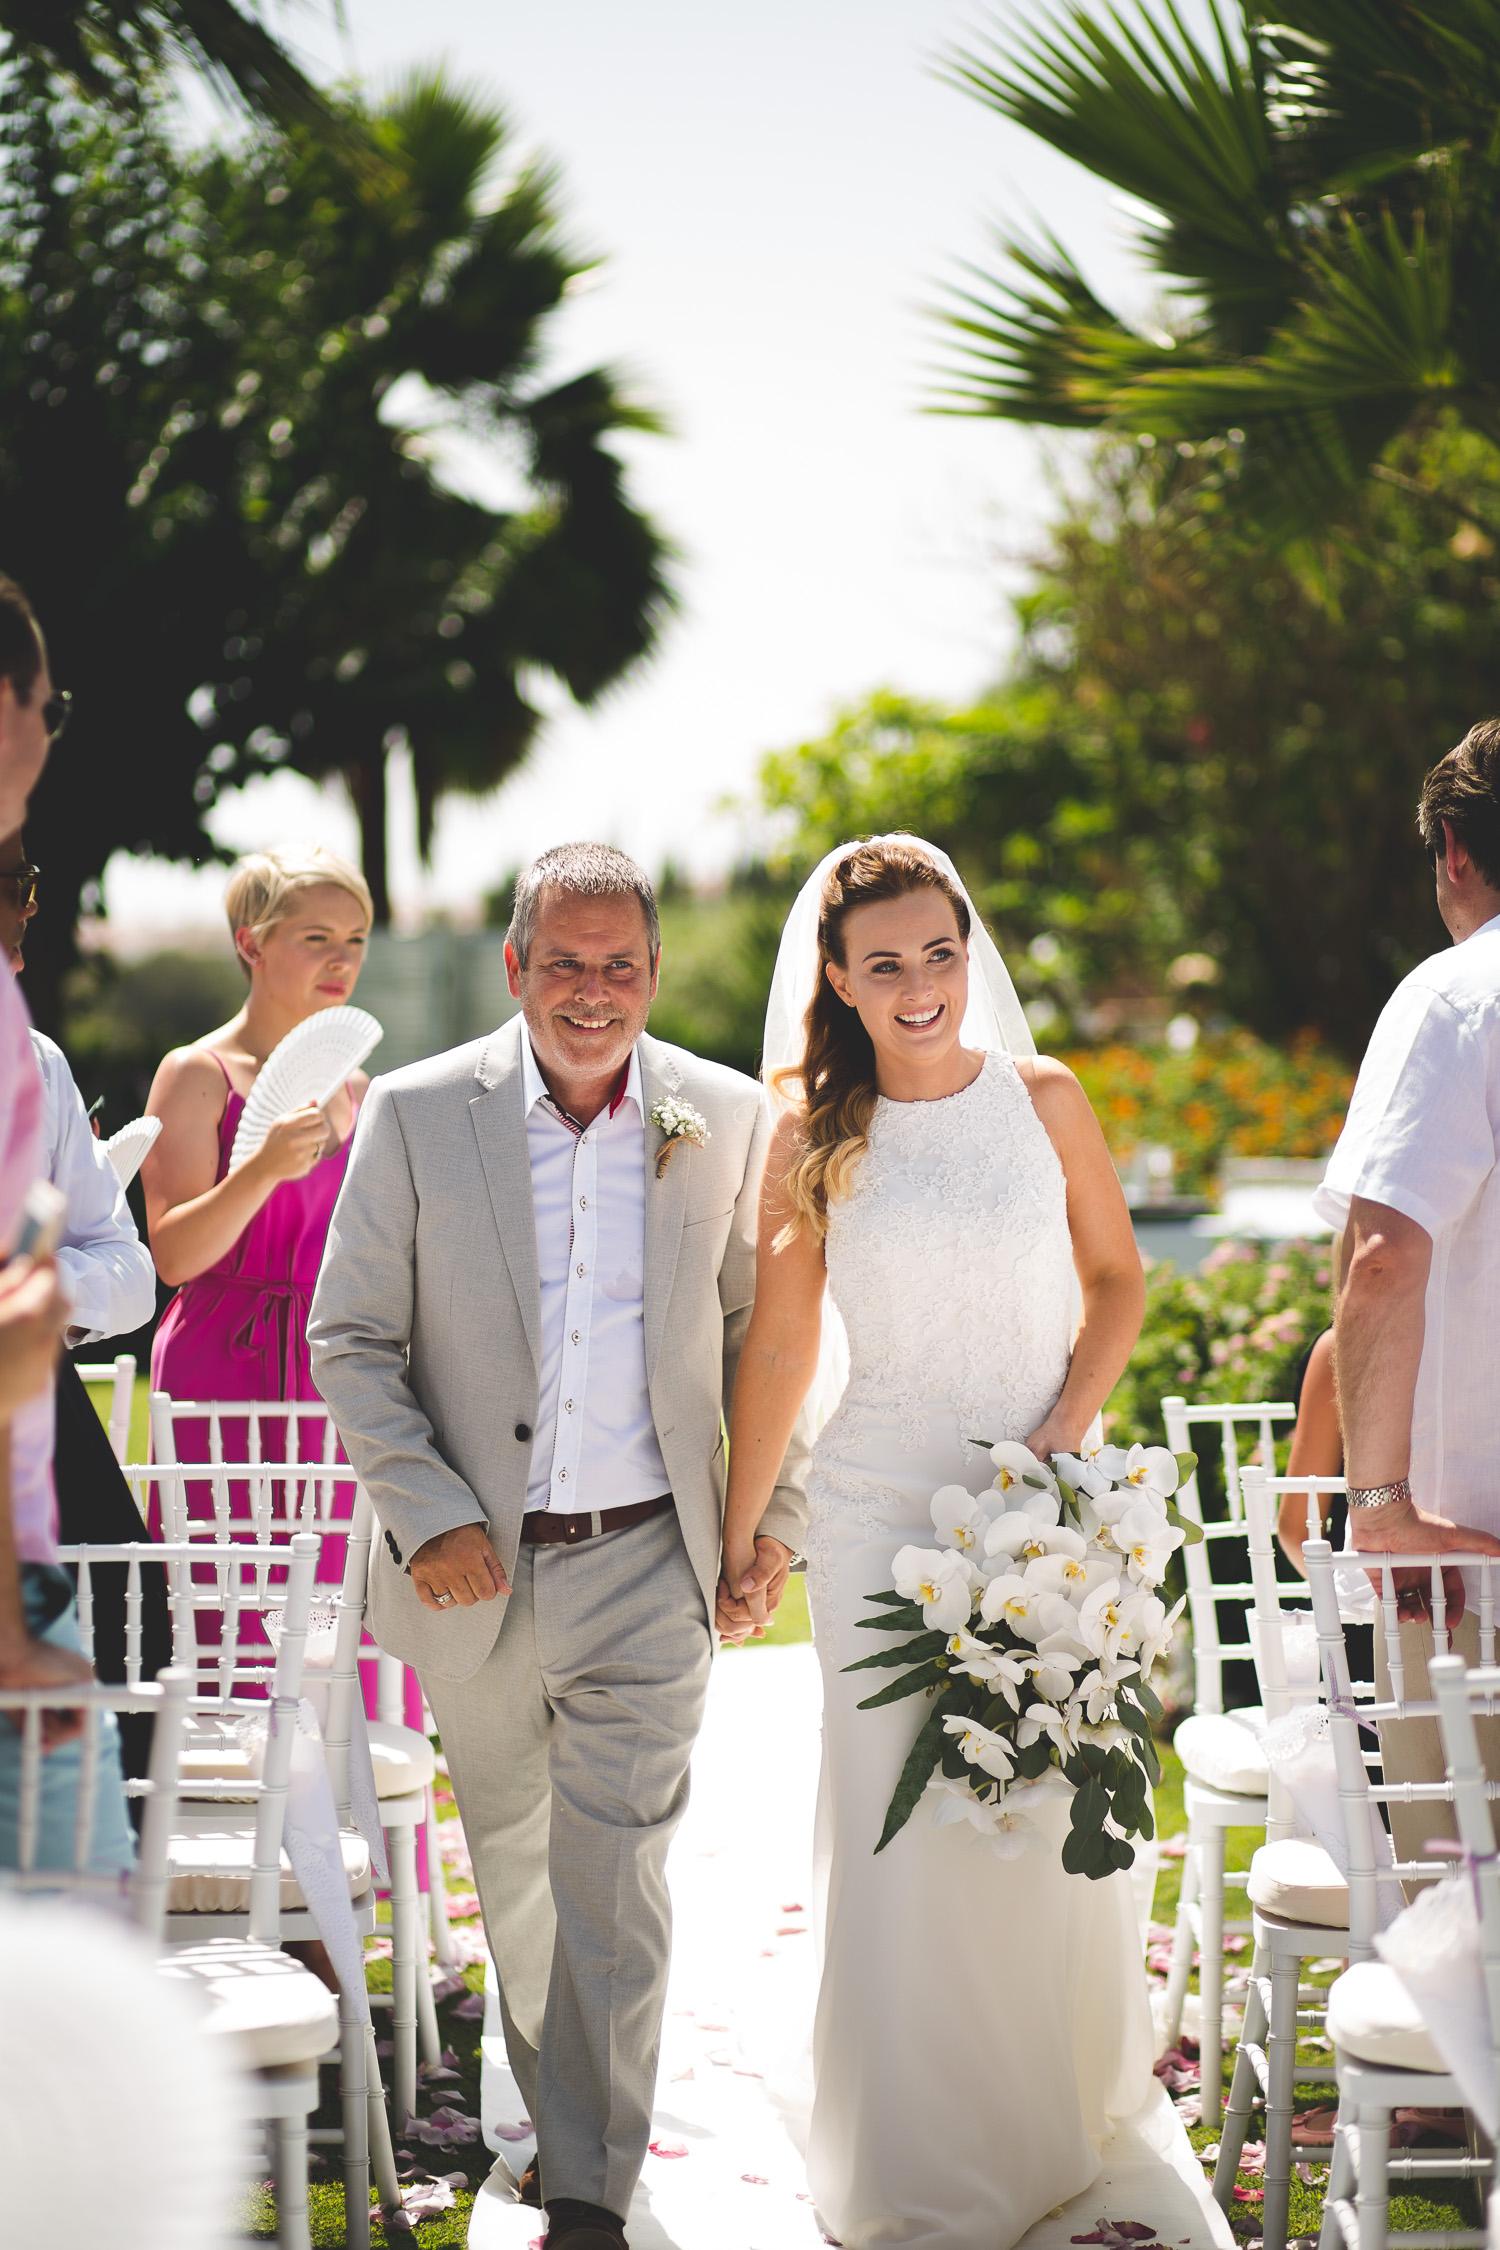 Surrey Wedding Photographer Kit Myers Paige Craig Spain051.jpg